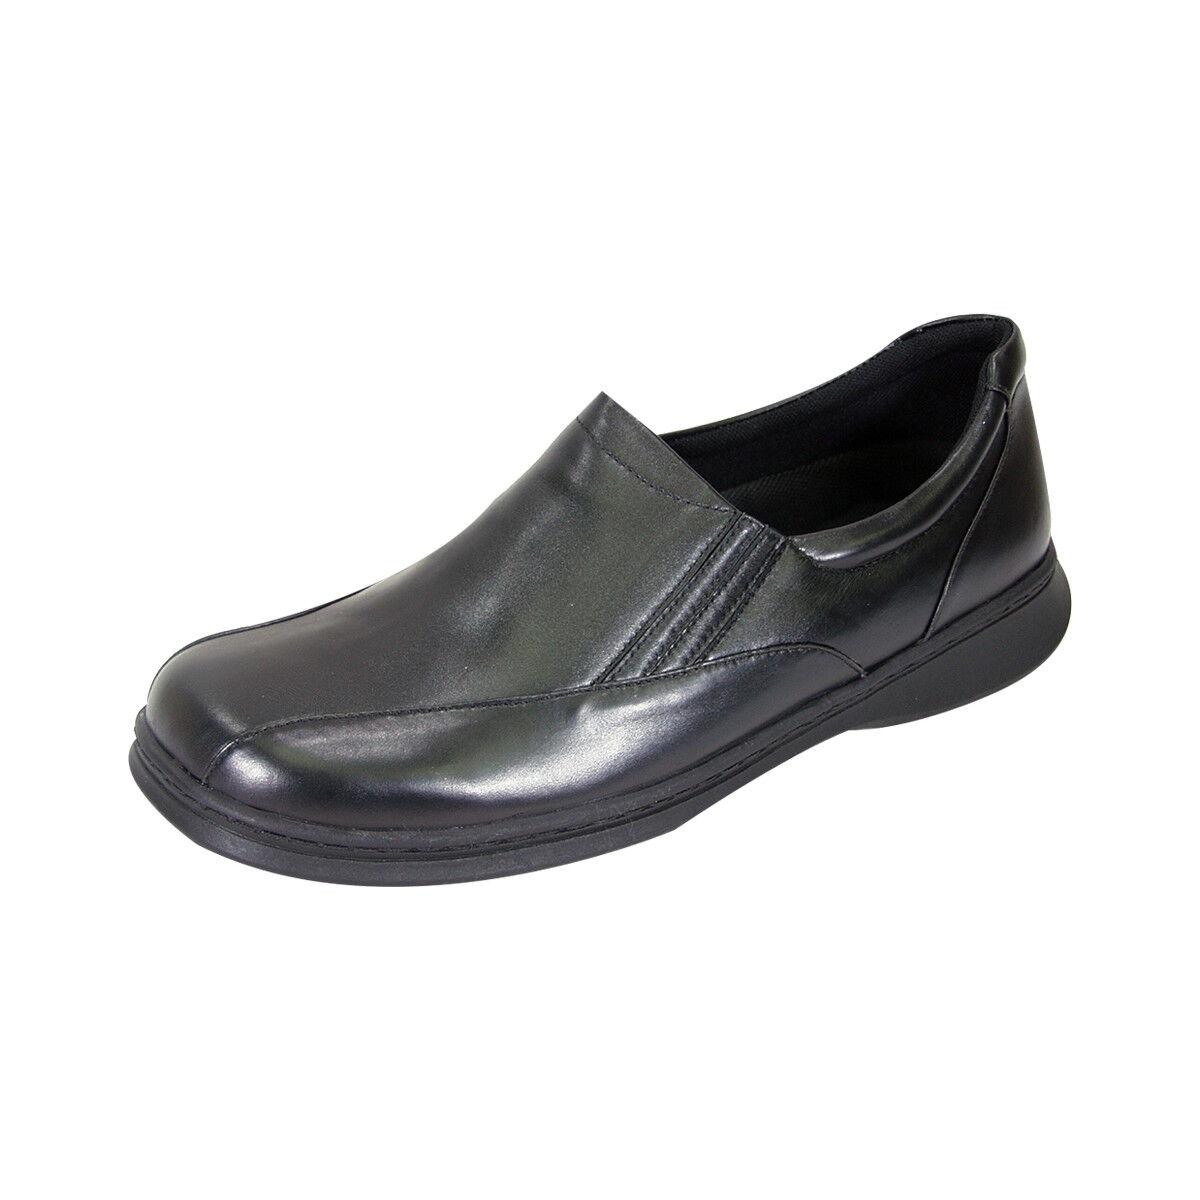 24 HOUR COMFORT Blaire Damens Wide Width Durable Comfort Slip-On Leder Schuhes